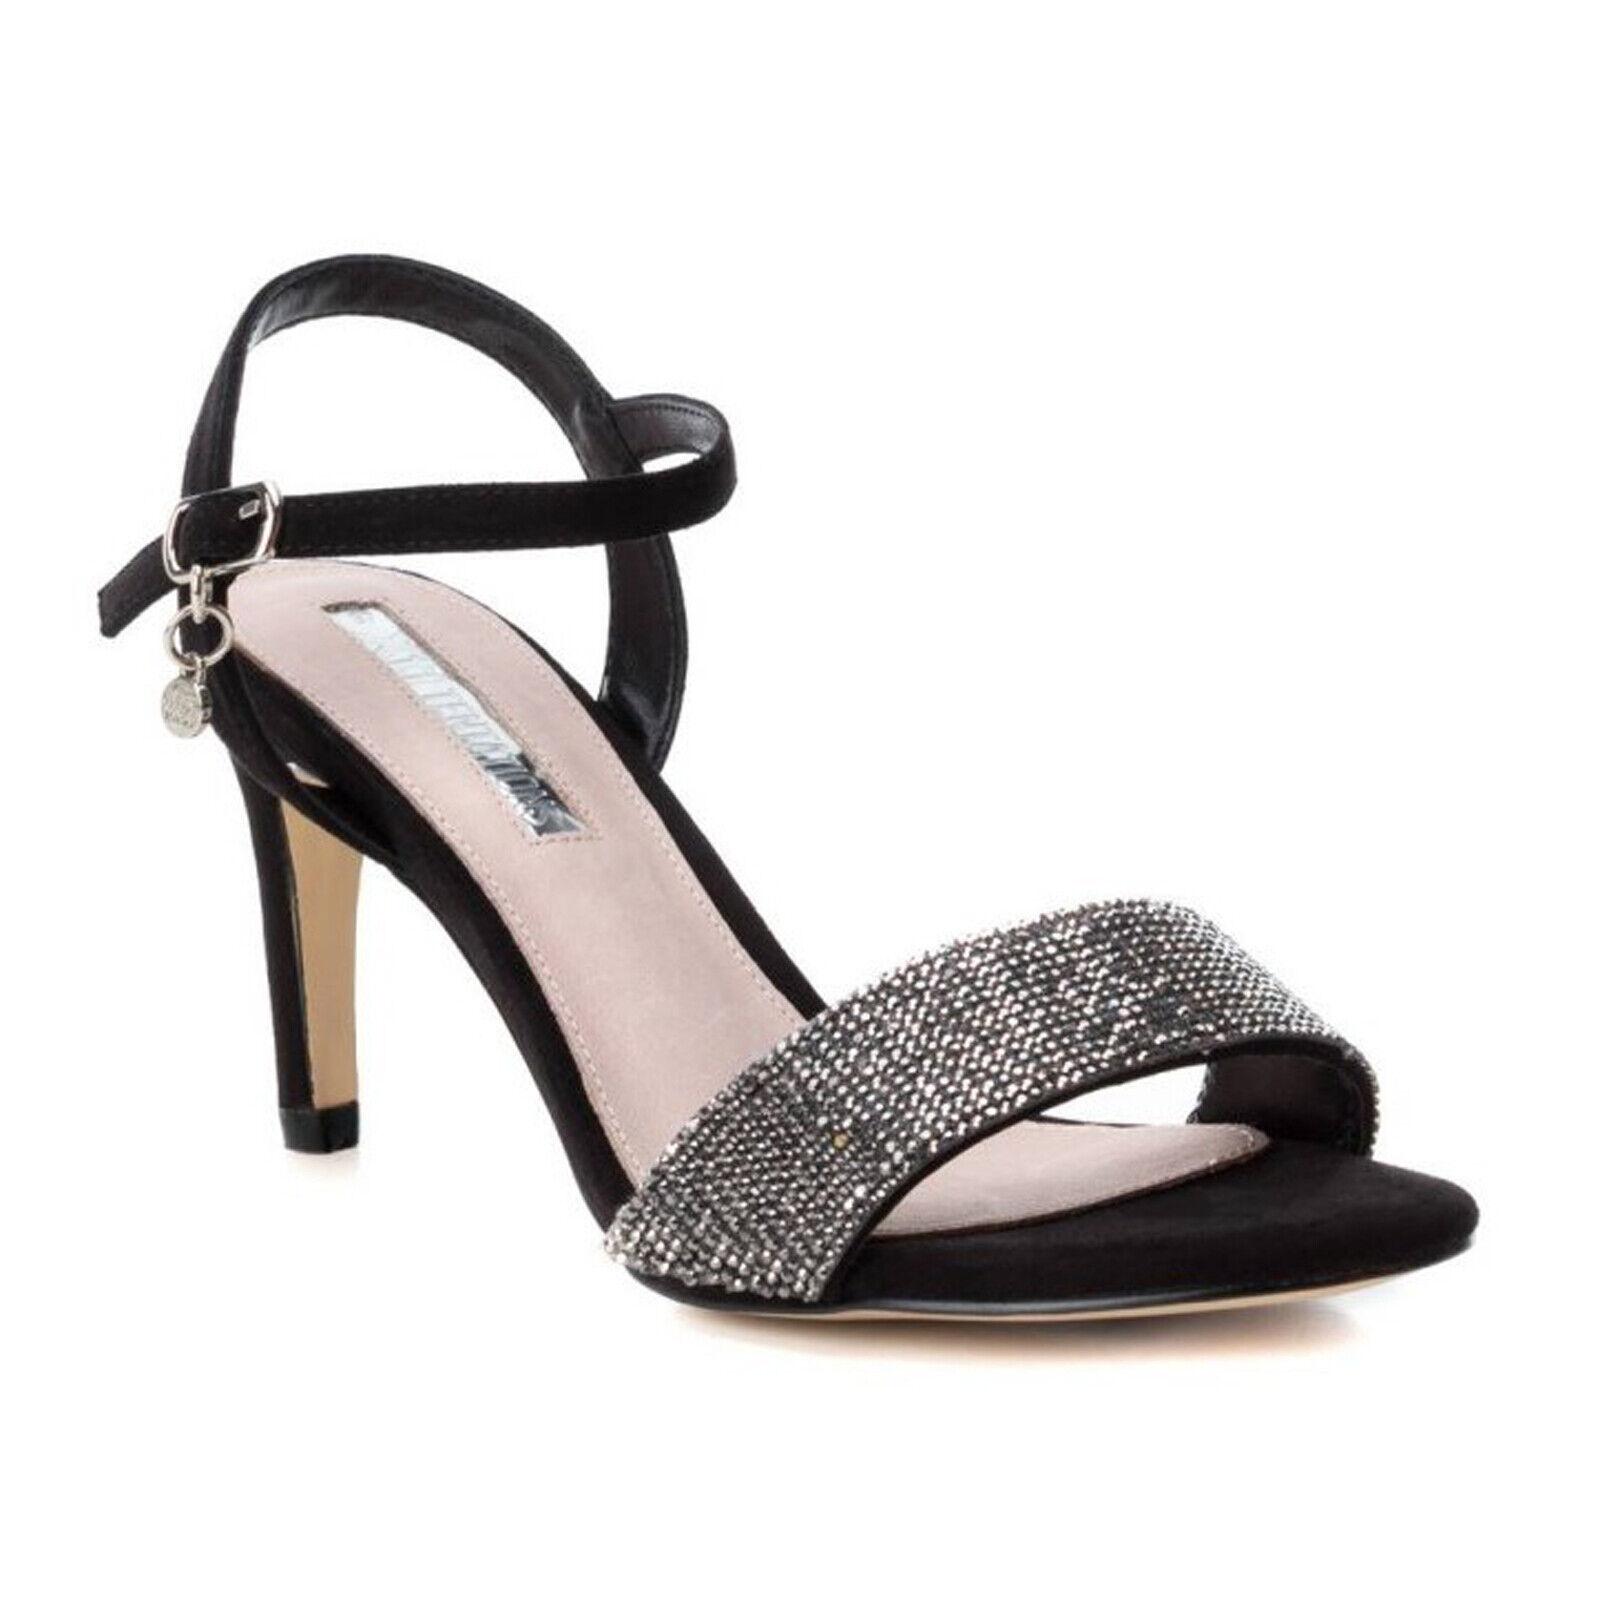 ☼ELEN☼ Sandales à talons - Xti - Ref   1008